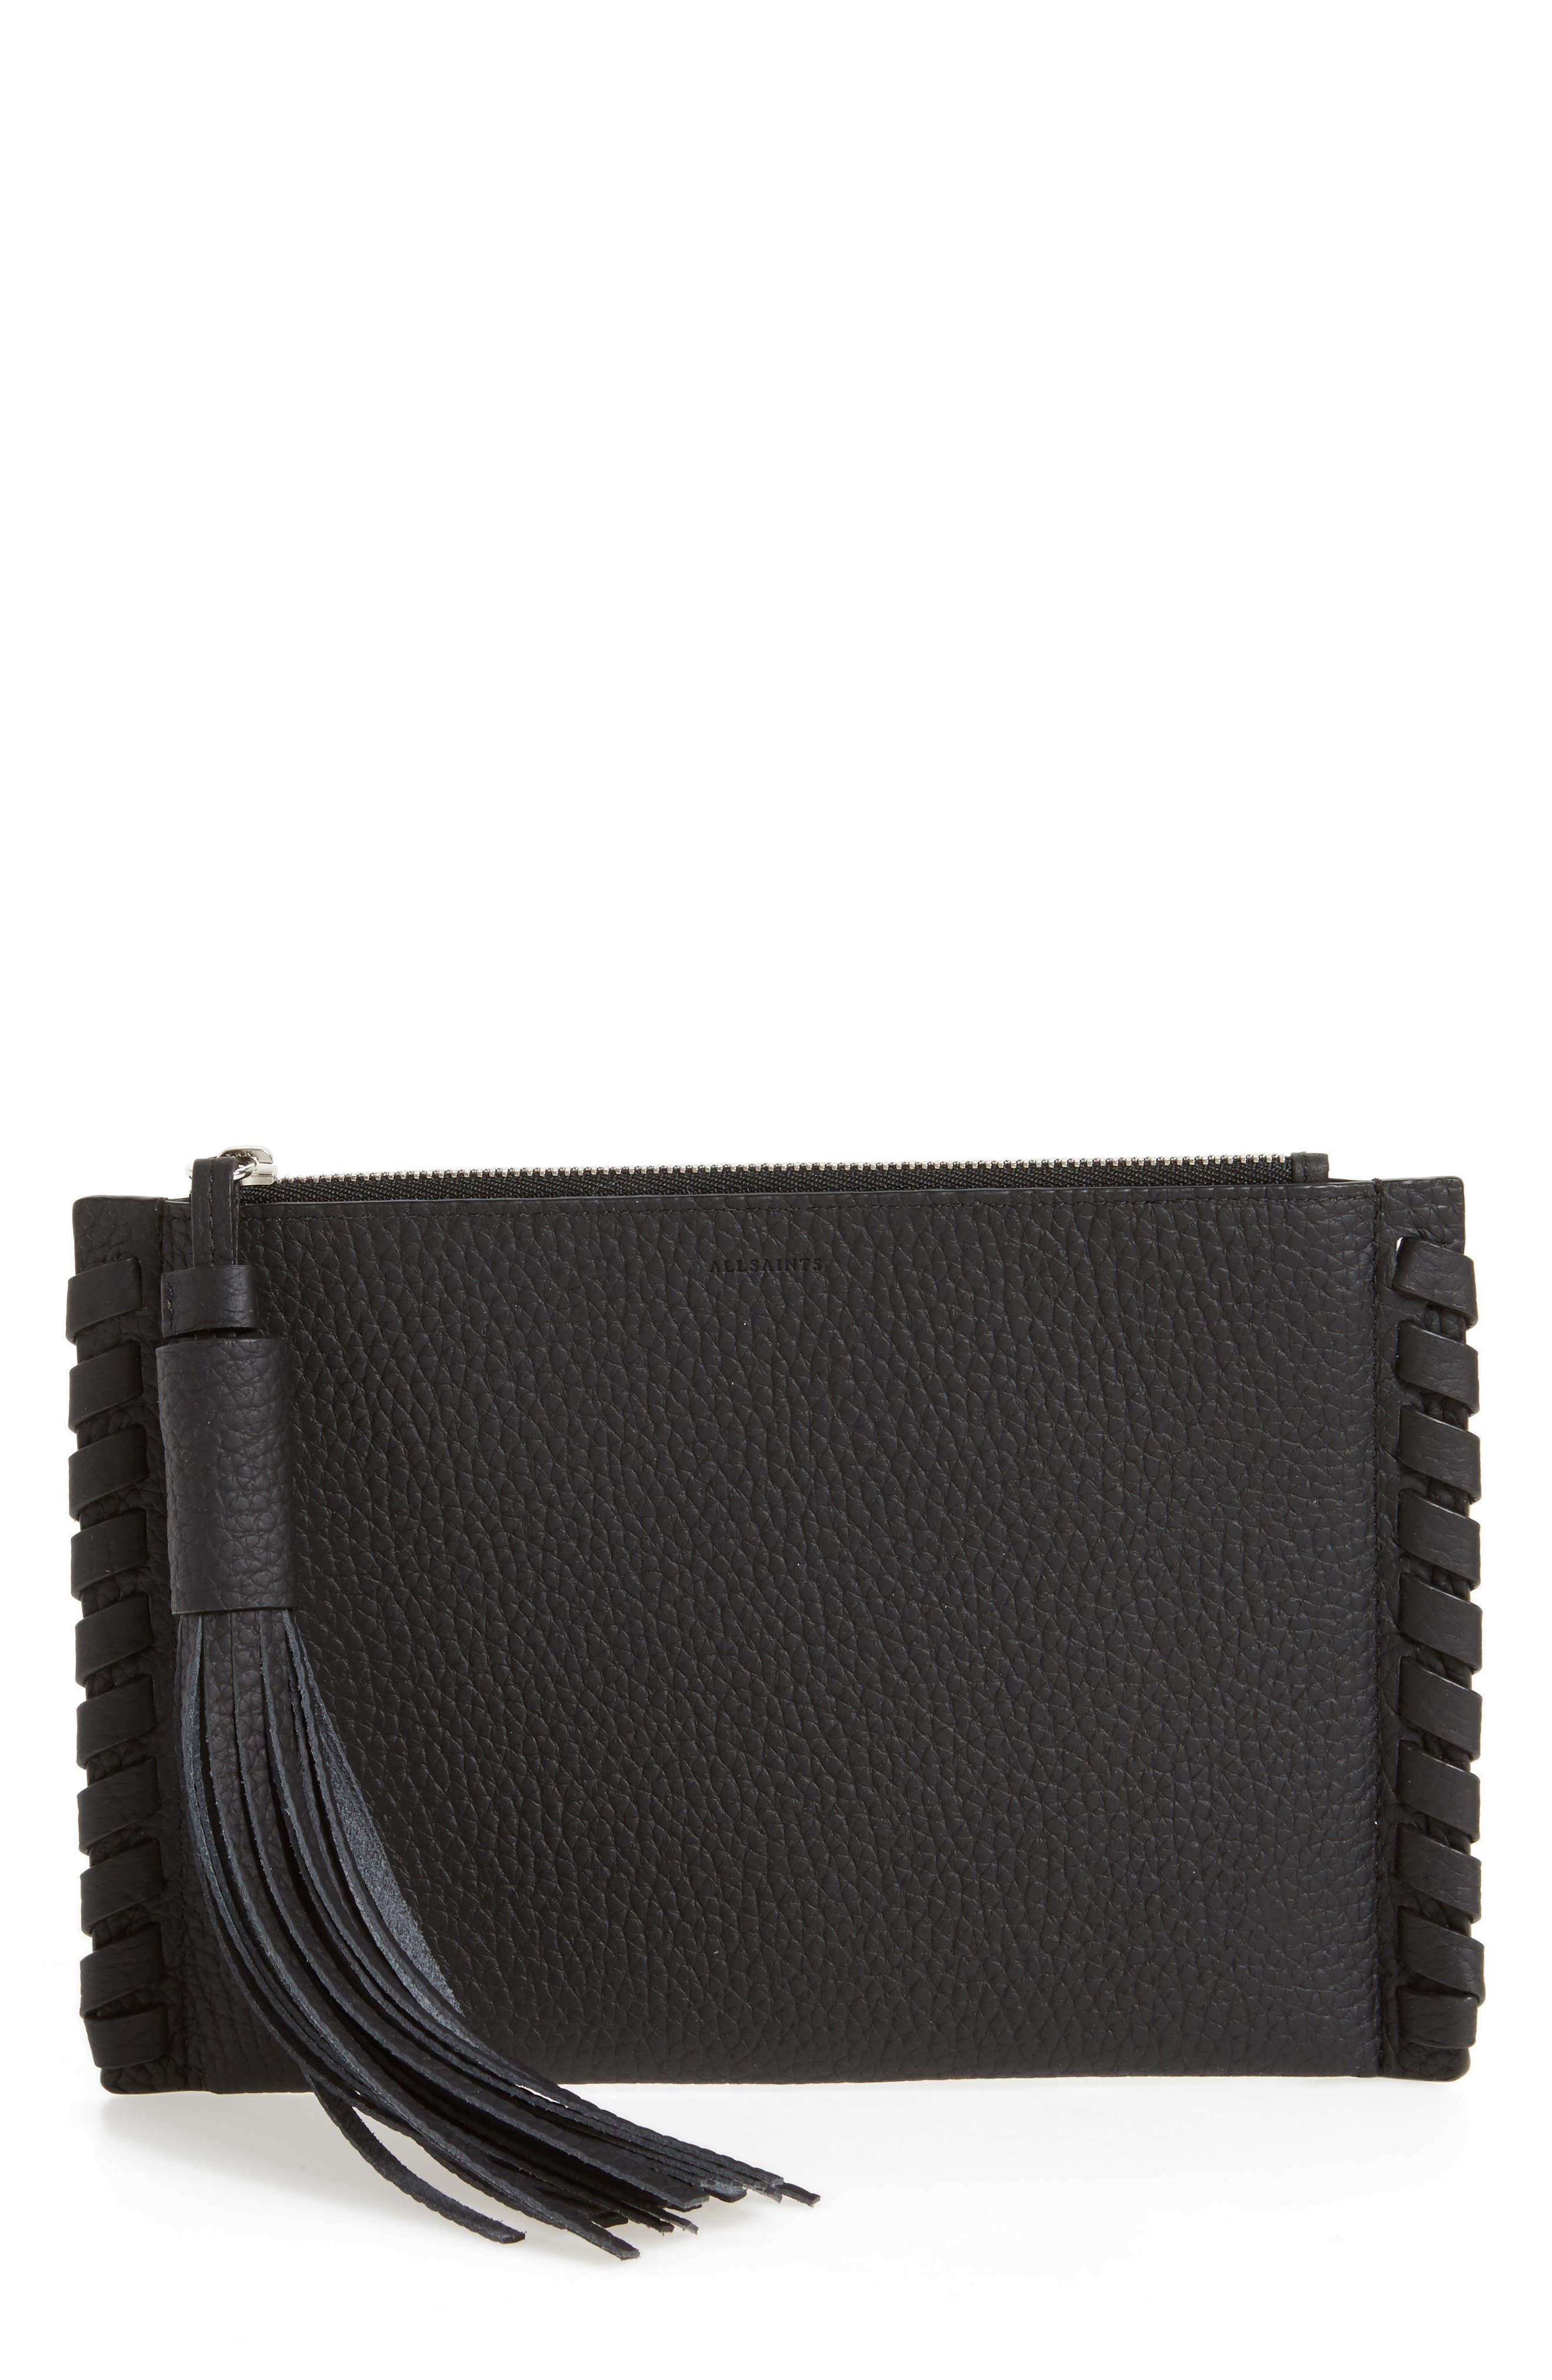 ALLSAINTS Small Kepi Leather Zip Pouch